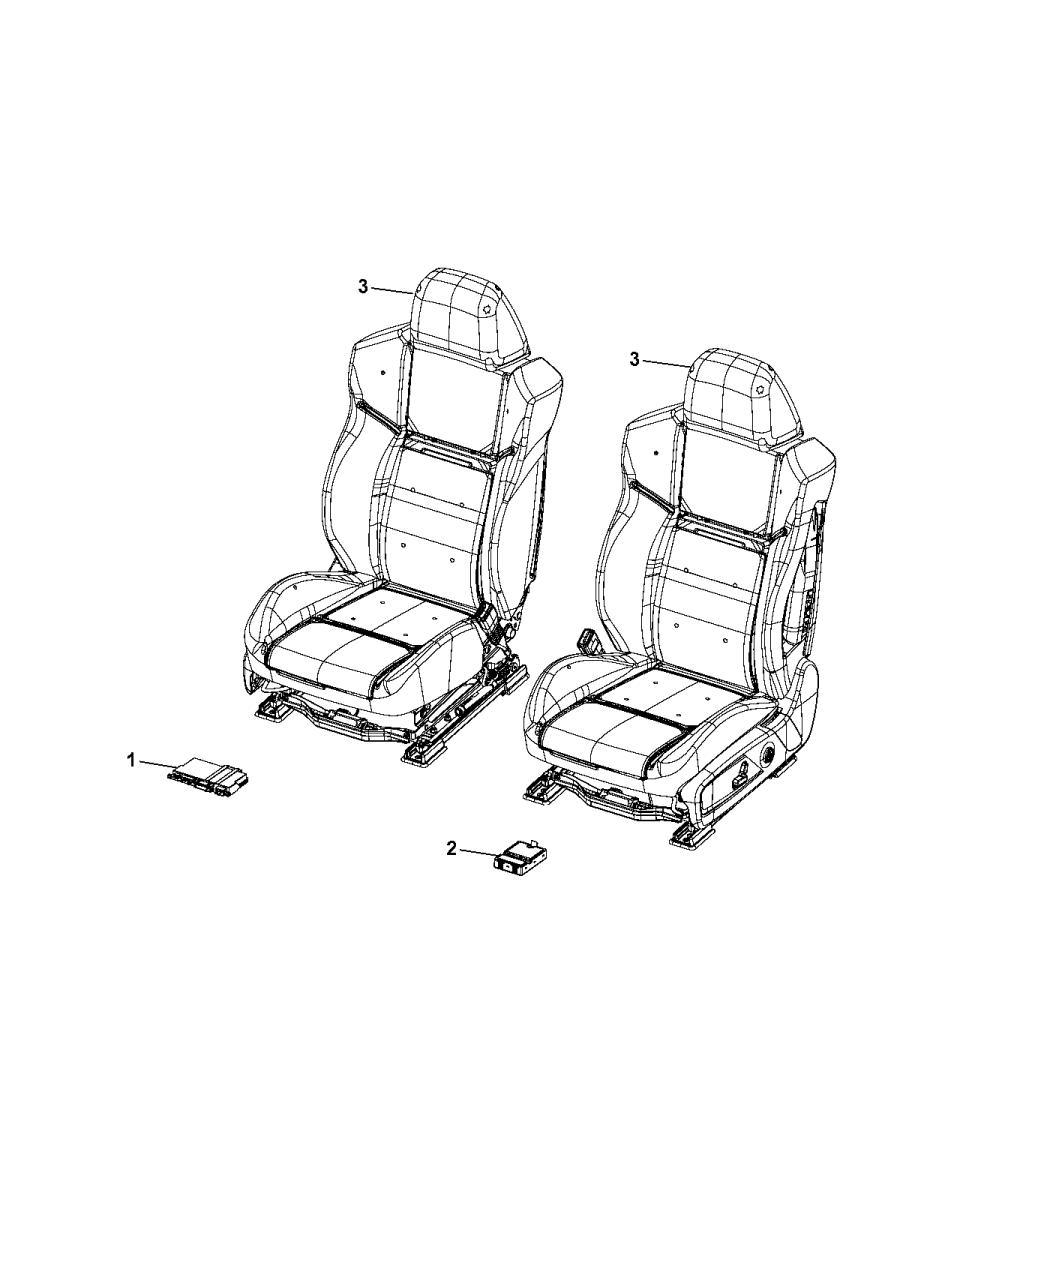 68277207AC  Genuine Mopar MODULEHEATED    SEAT